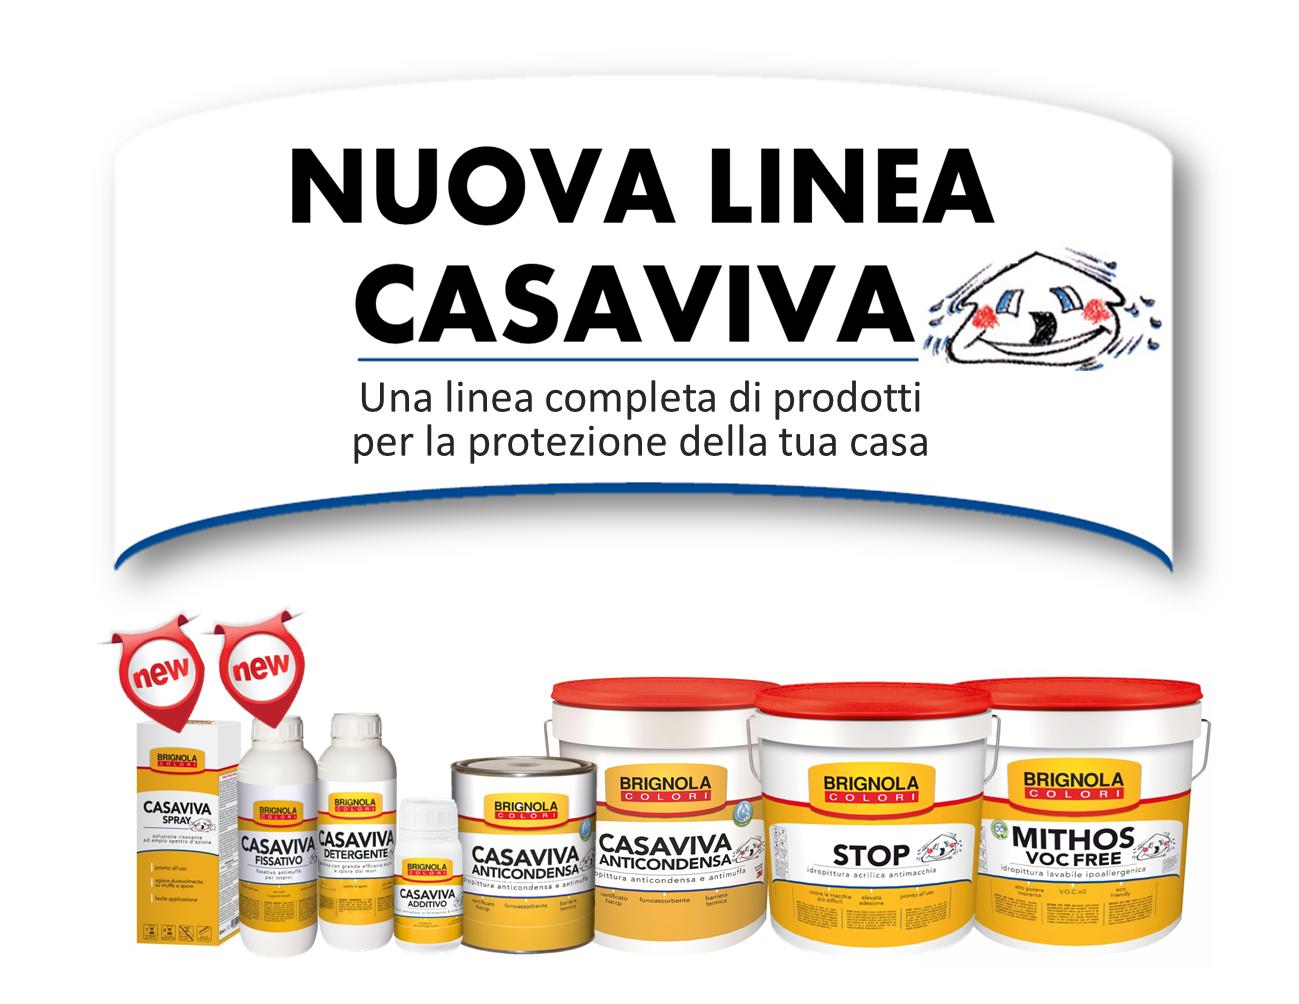 Nuova Linea Casaviva